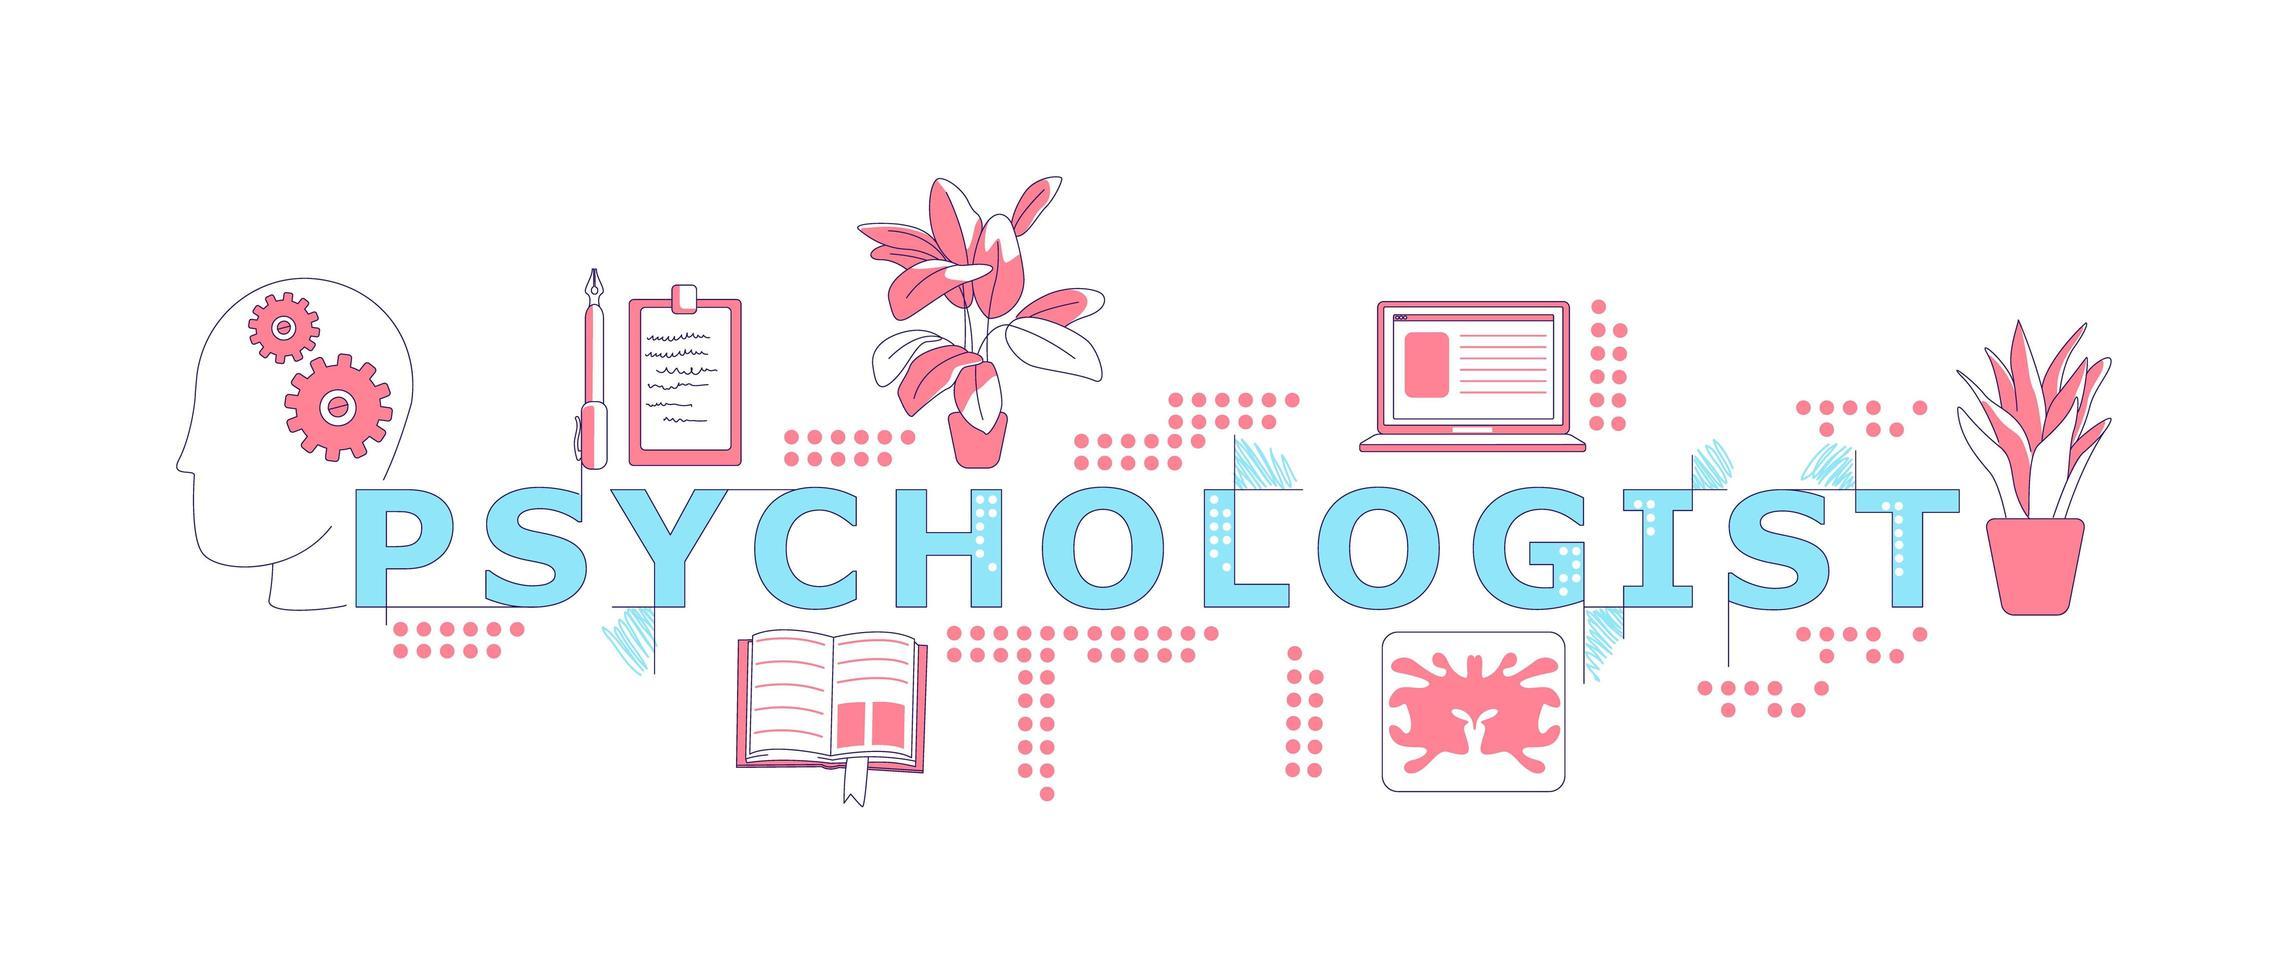 psicólogo palavra conceitos palavra banner vetor